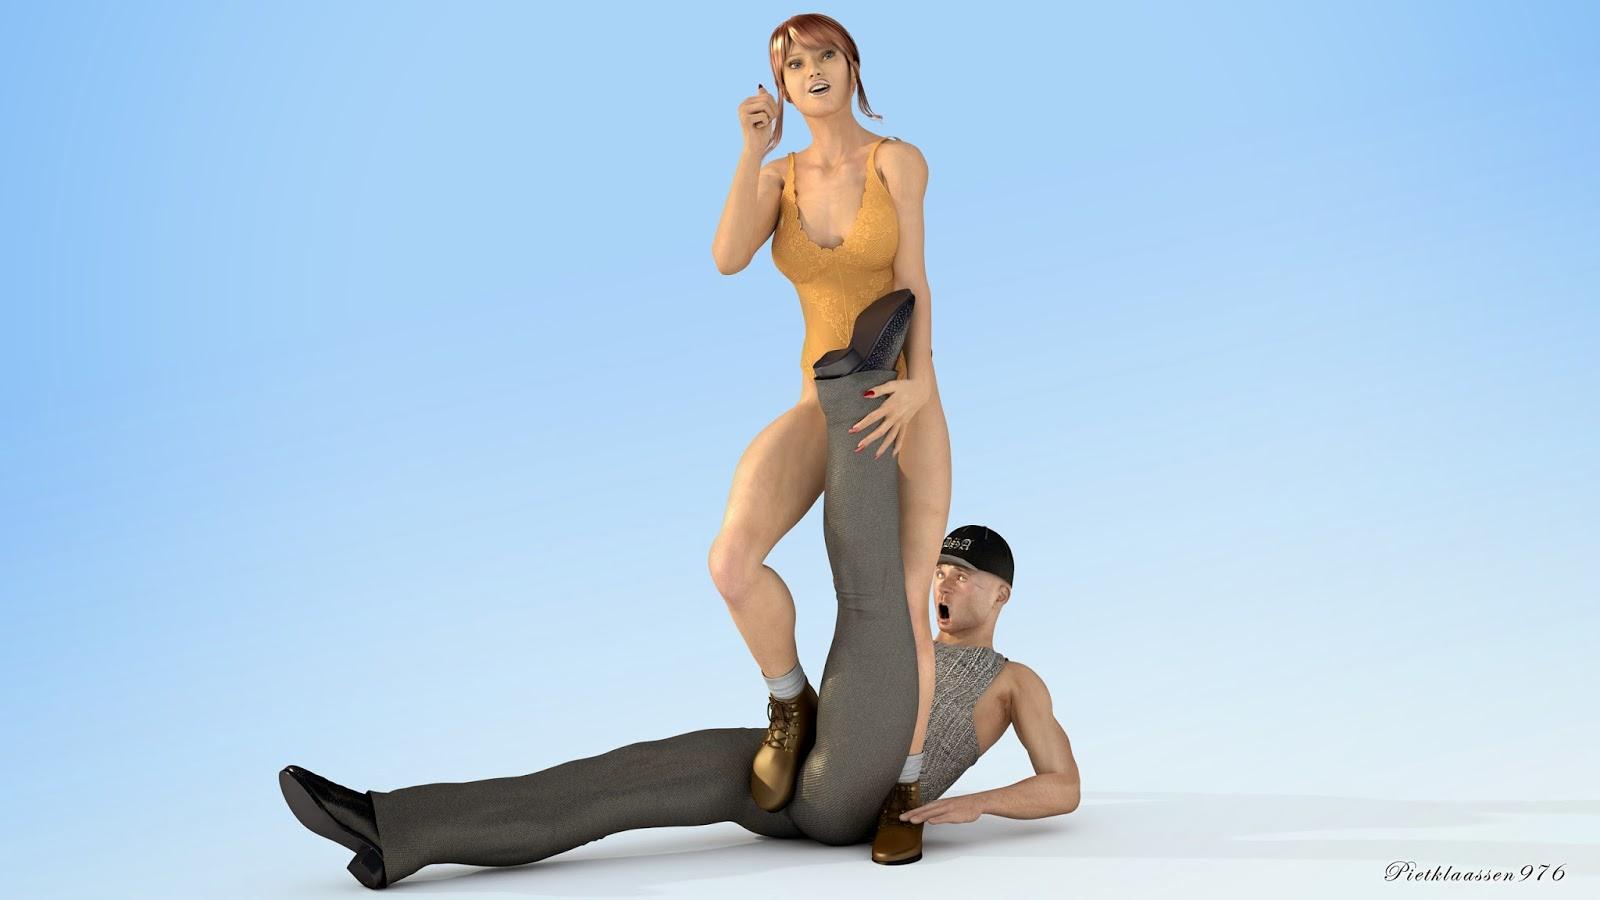 Bondage daily domination foot free spankings video